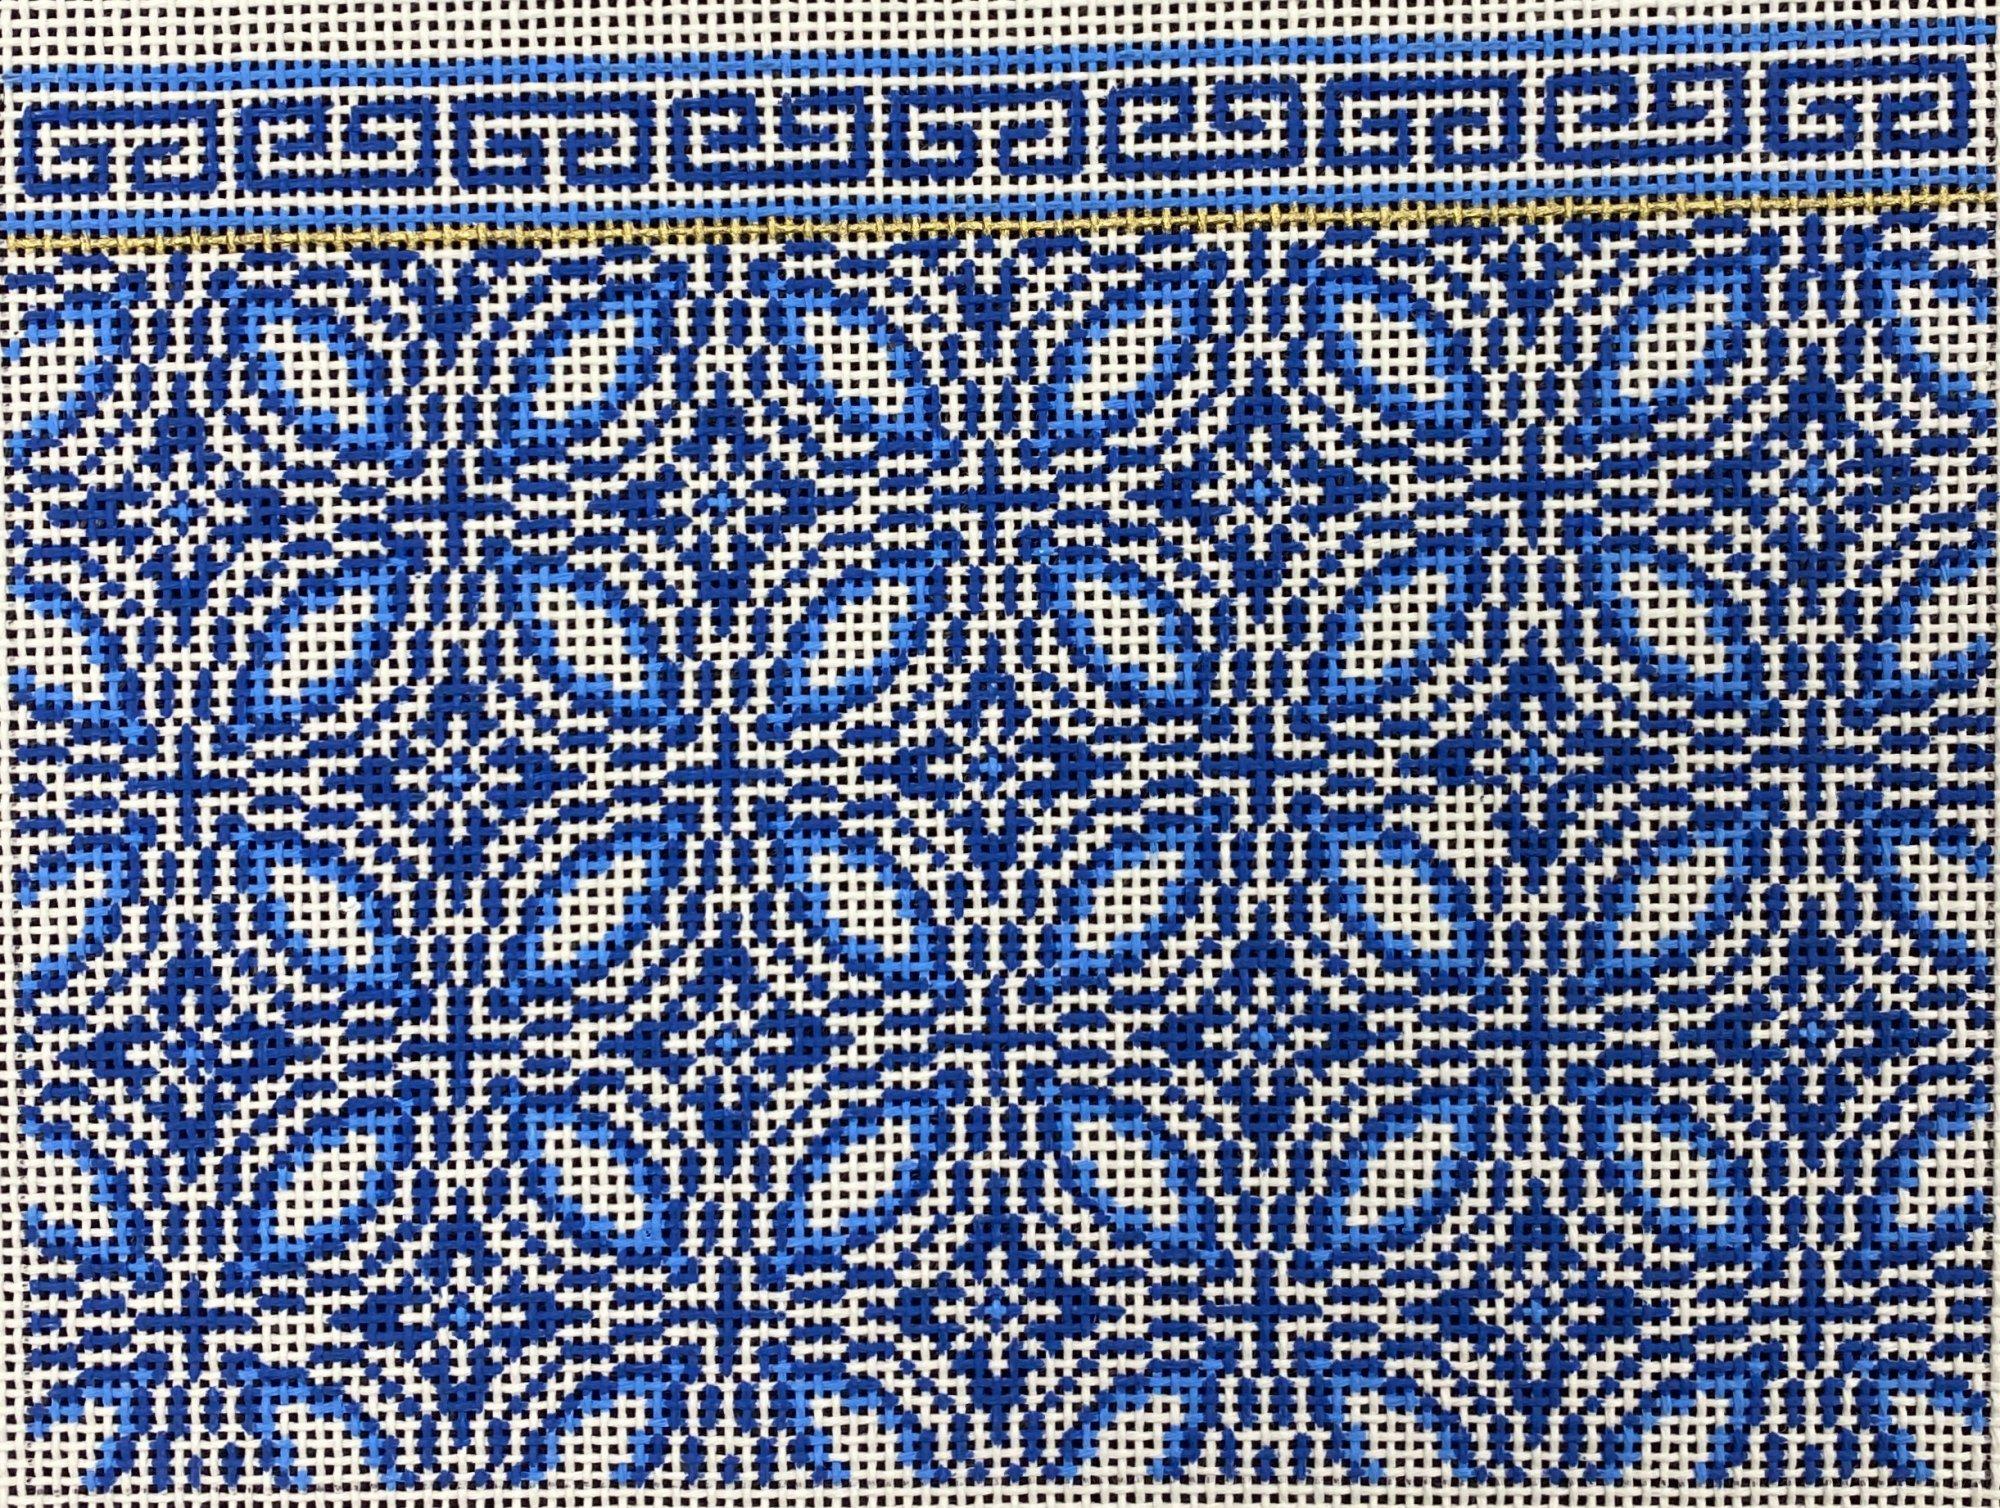 Blue /White Geometric,13 ct.,6x8.5